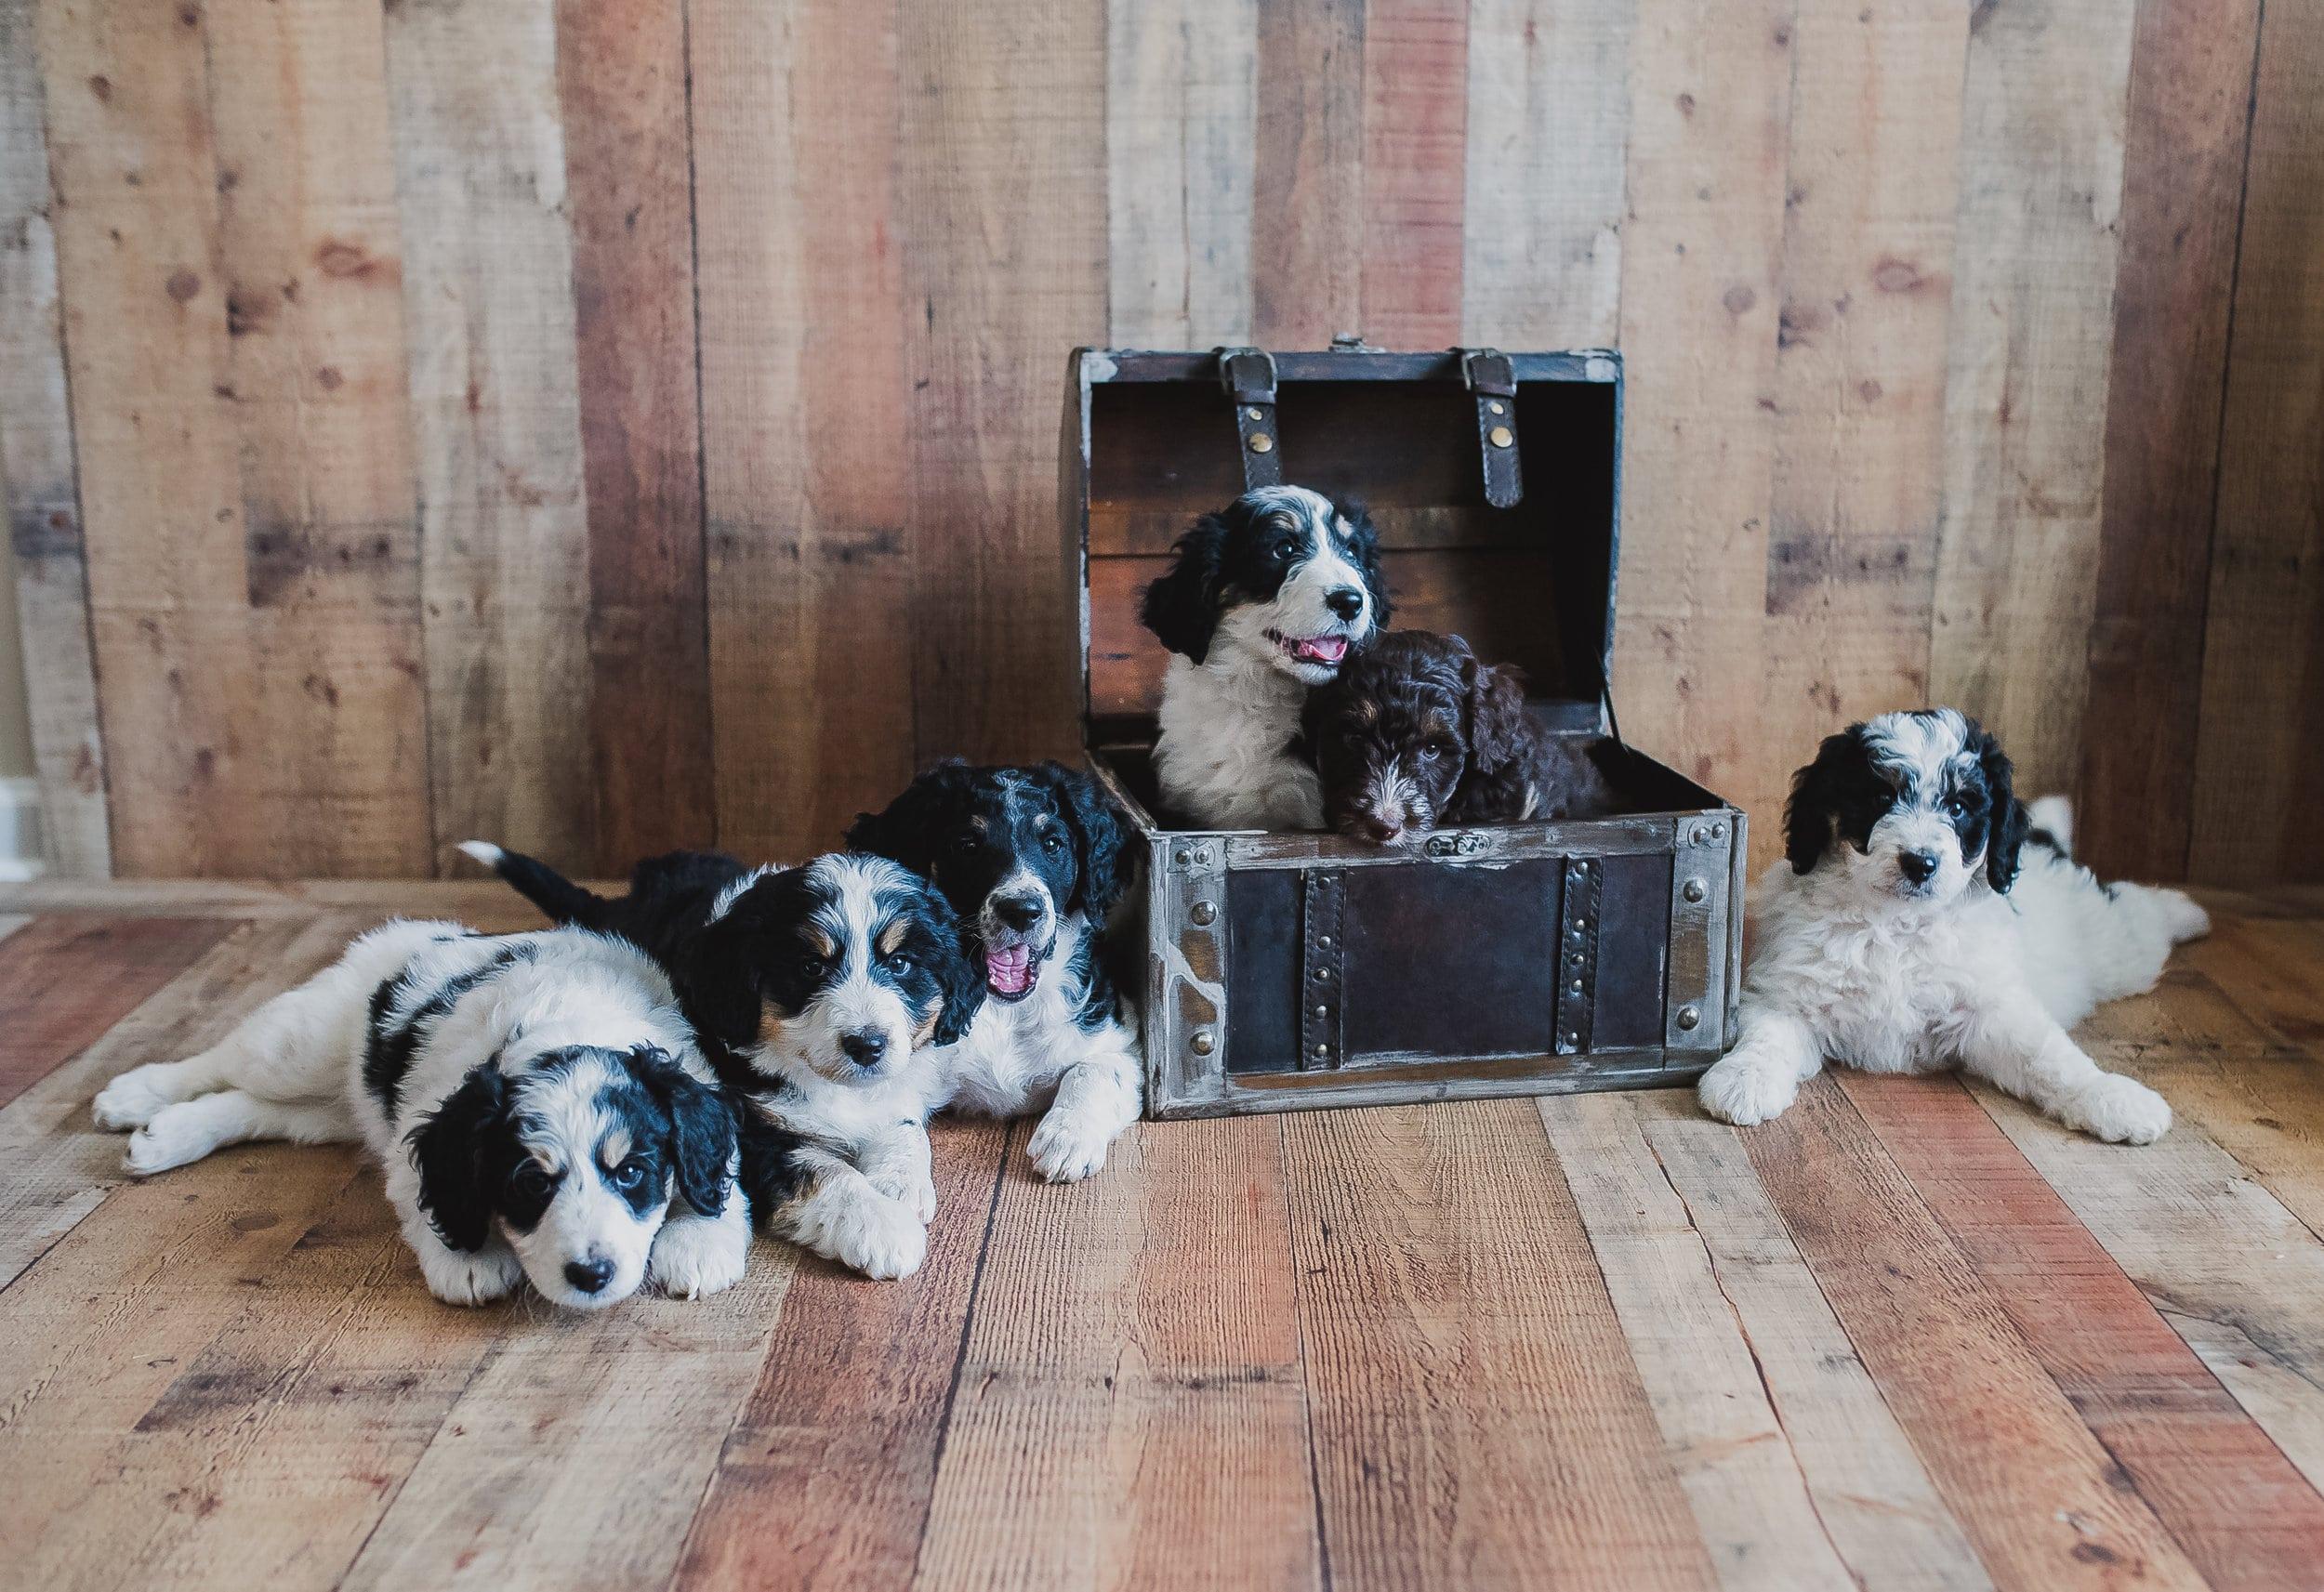 Crockett Doodles Family Raised Doodle Puppies For Sale